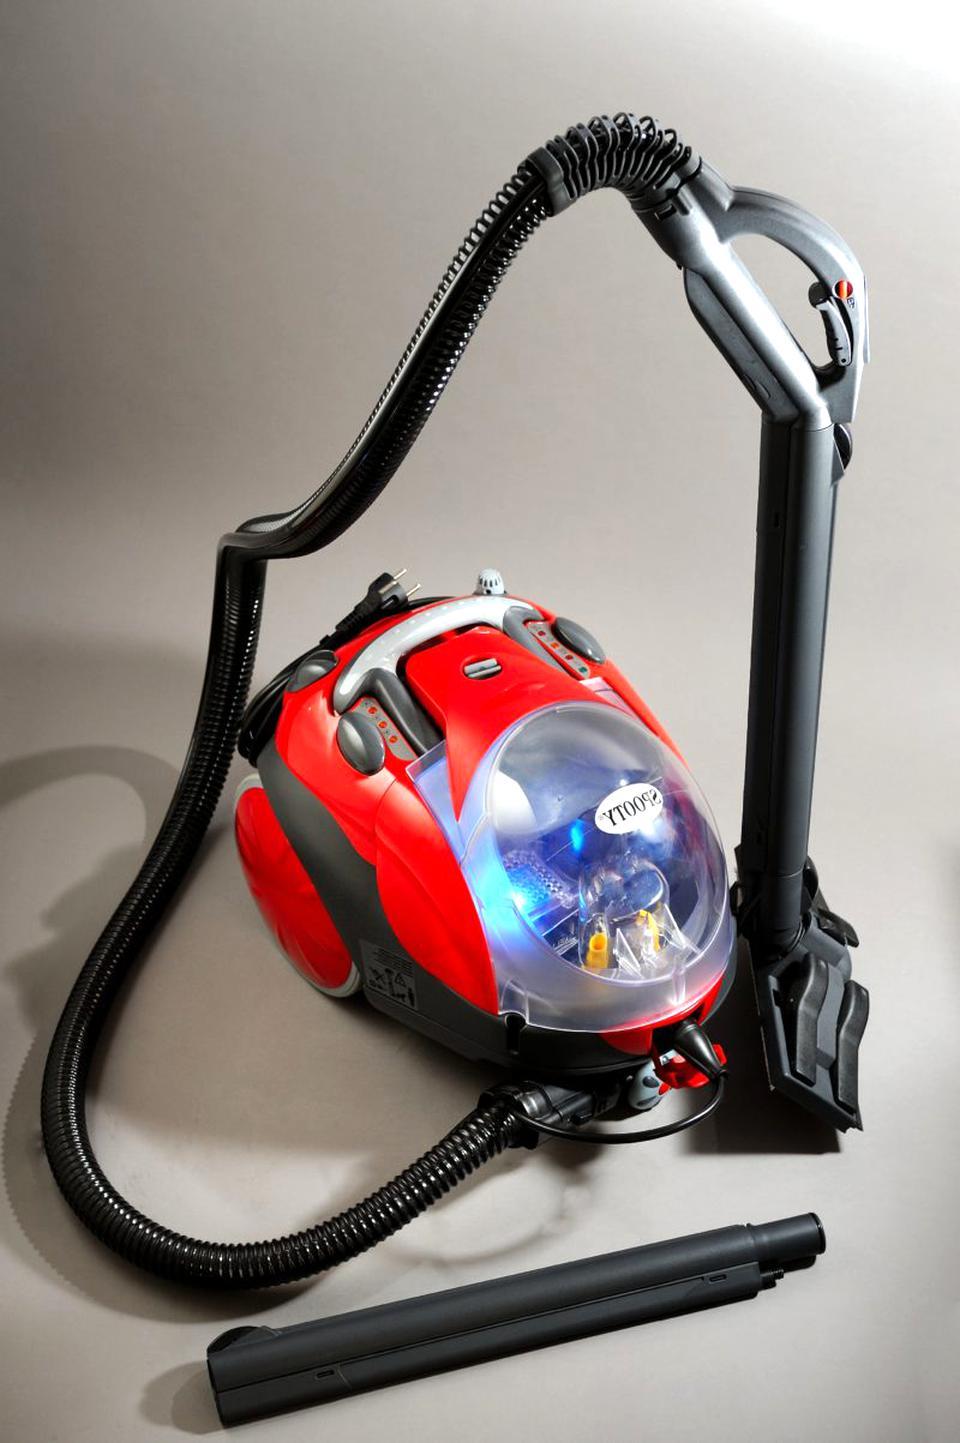 Aspirateur Nettoyeur Vapeur SPOOTY Aspirateur robot